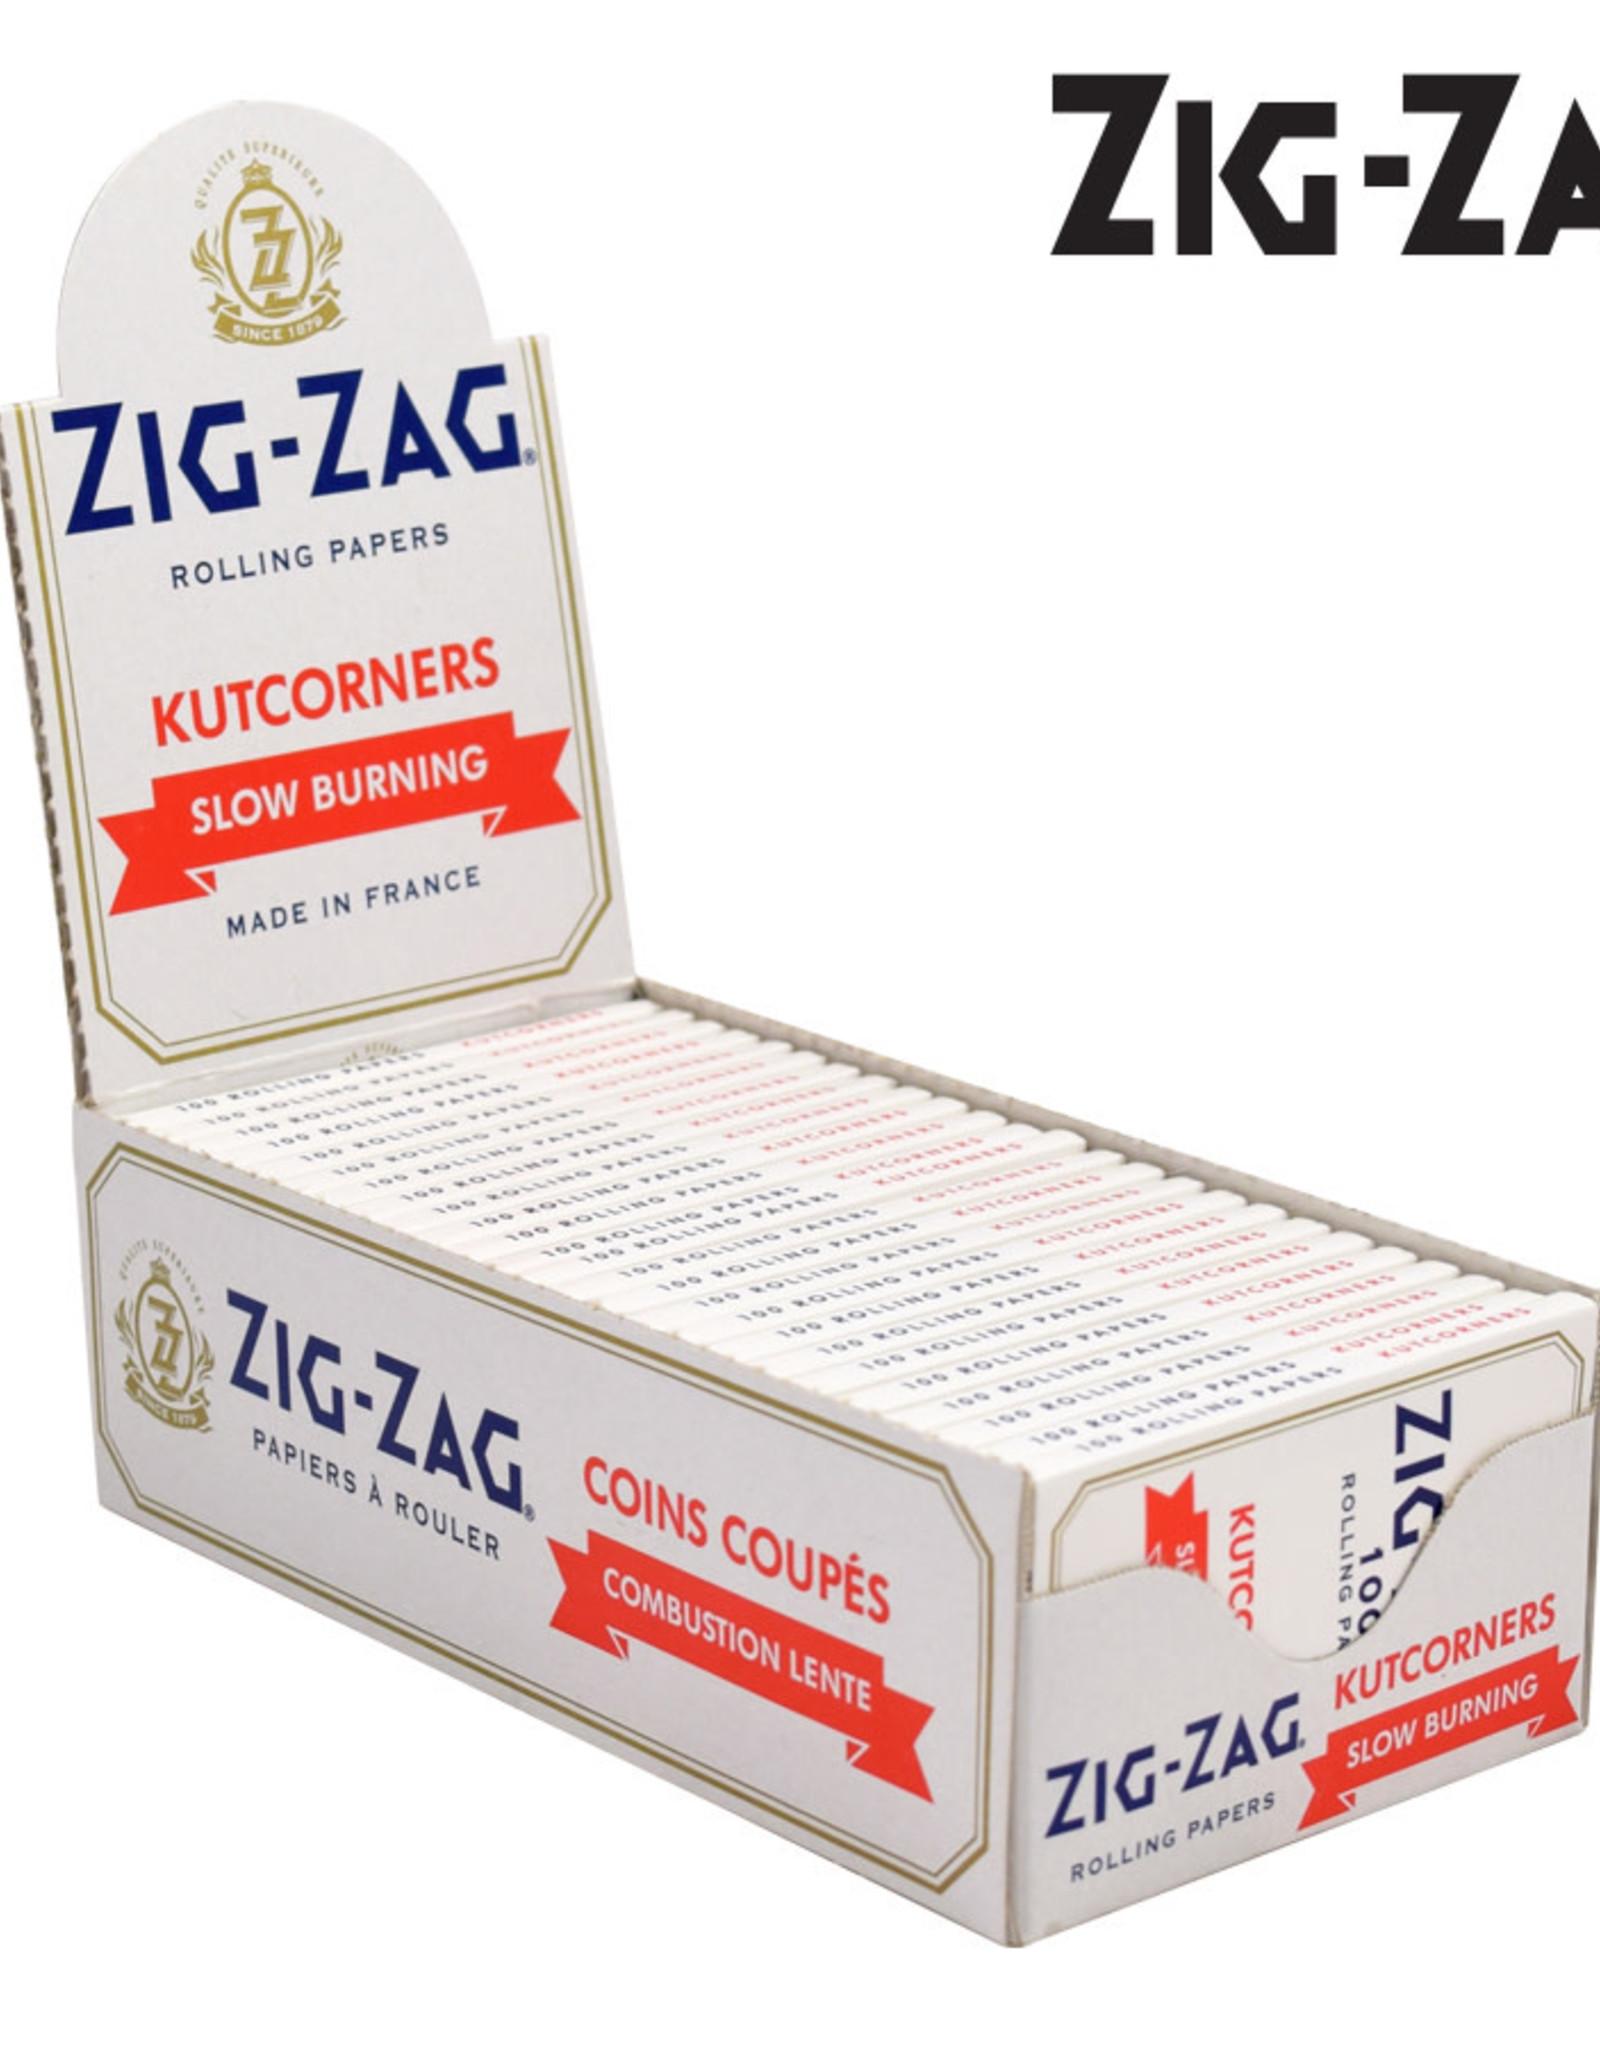 Zig Zag Kutcorners SW